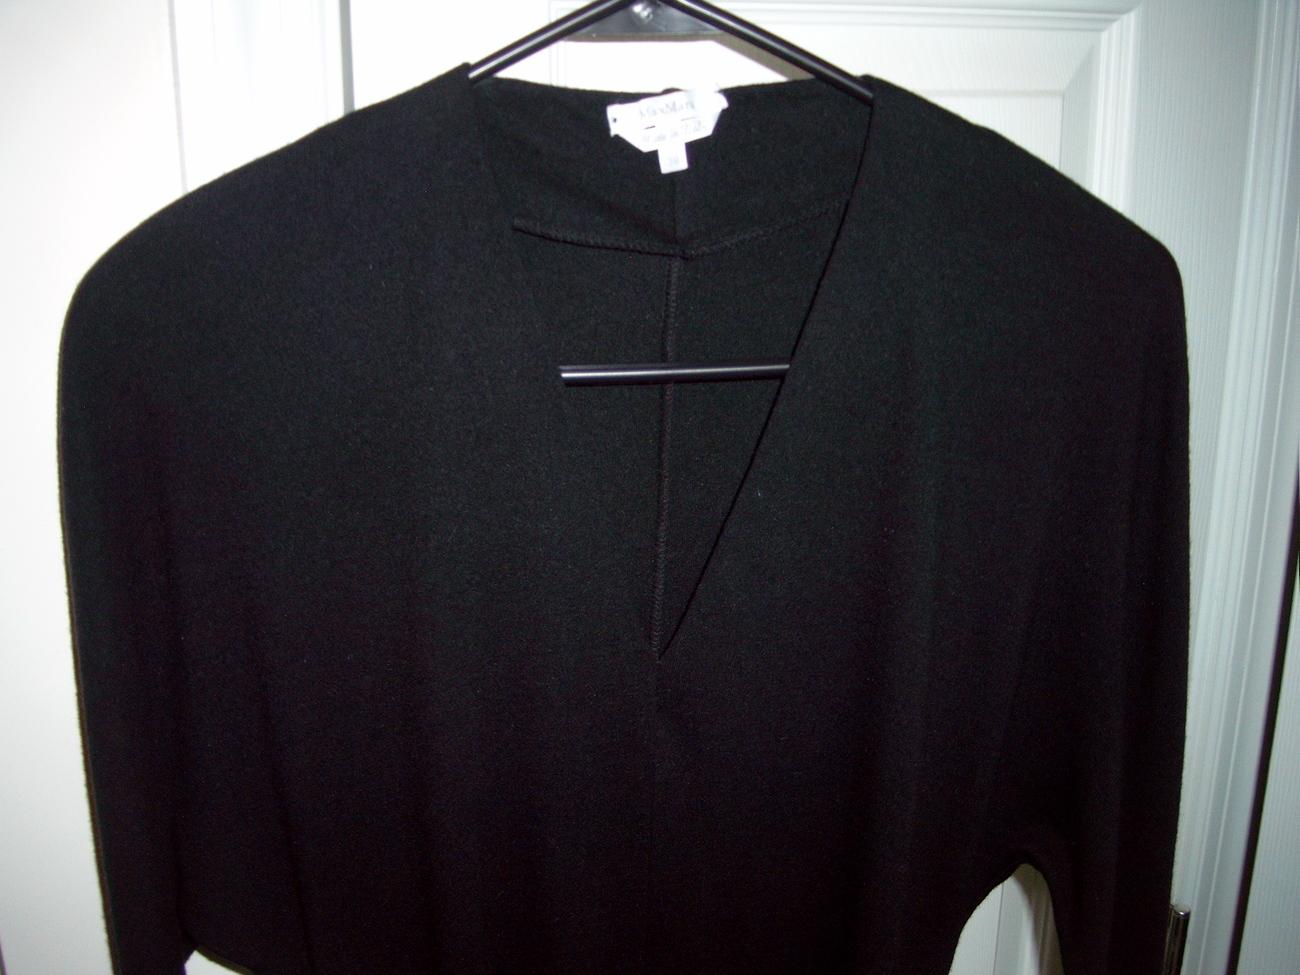 MAX MARA CLASSIC V-NECK BLACK WOOL FORMAL DRESS SIZE 38 Max Mara